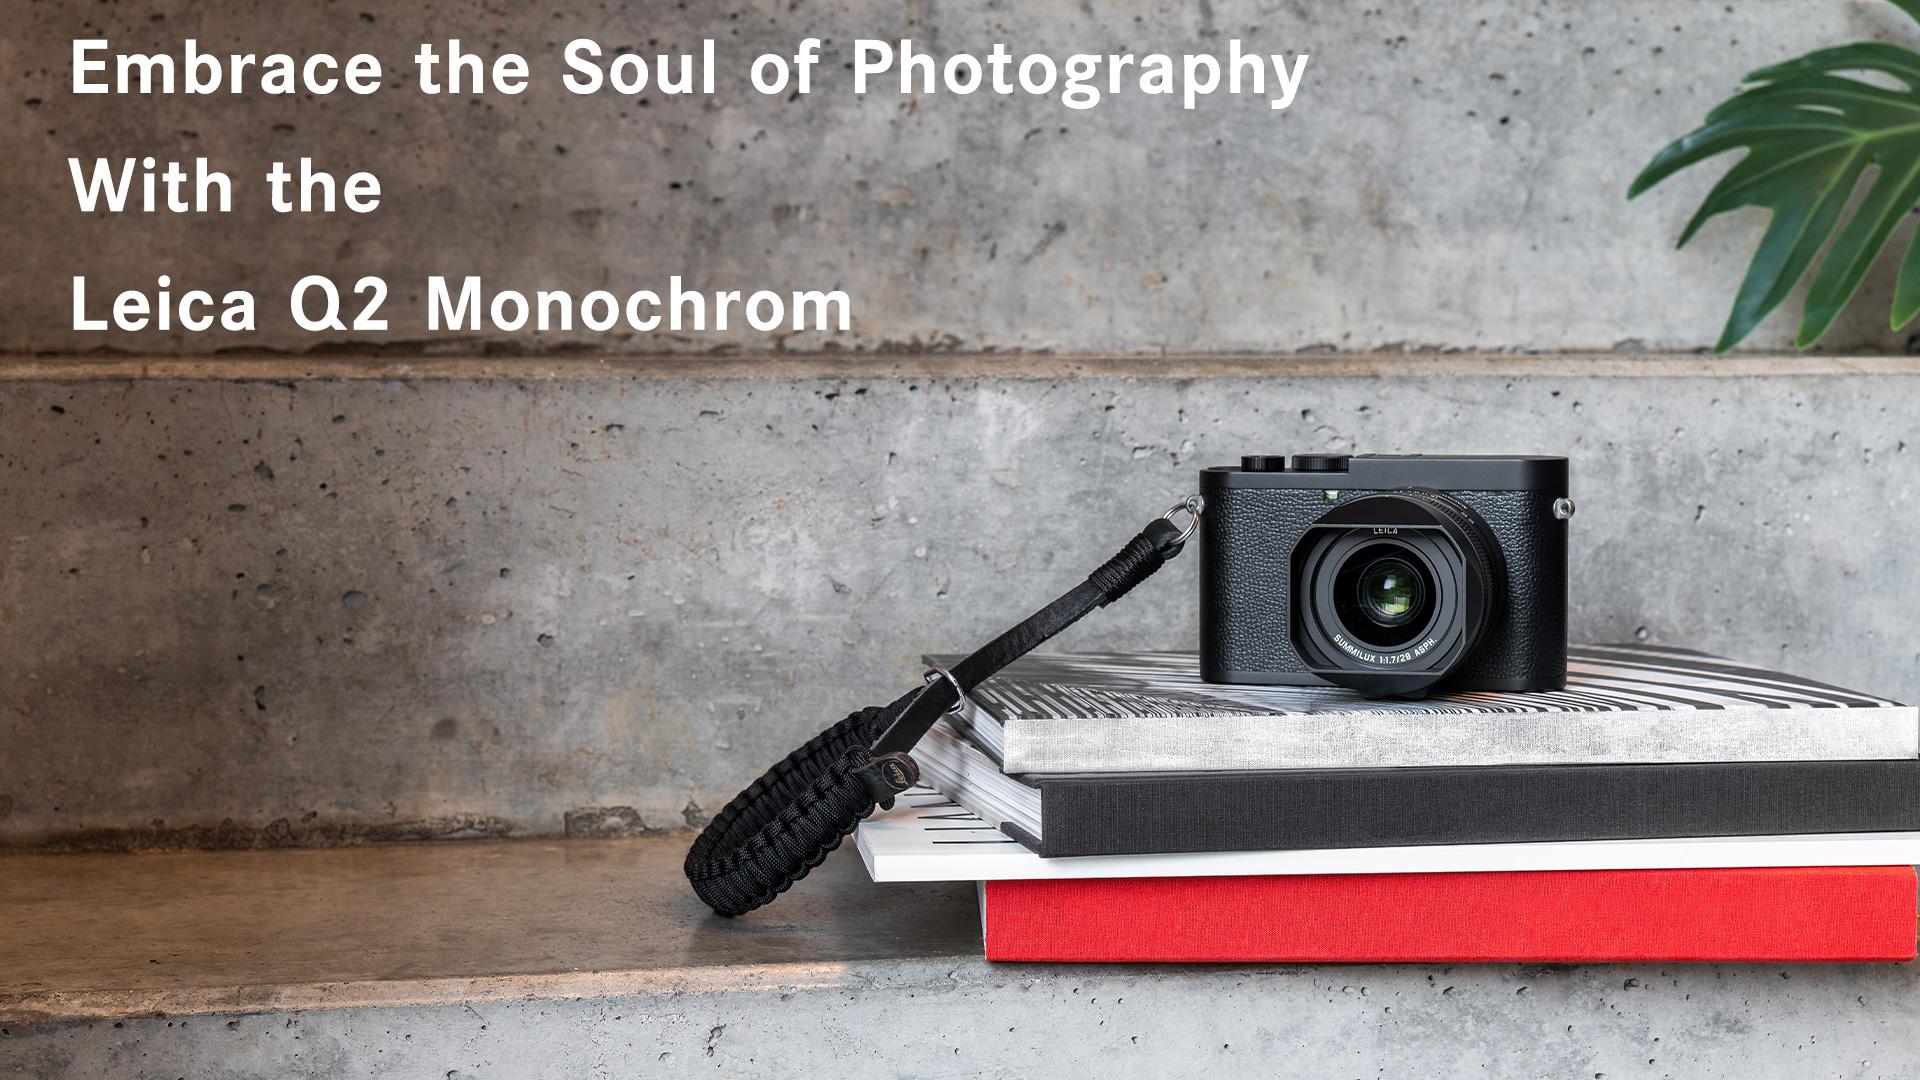 Leica Q2 Monochrom 47 mp black and white